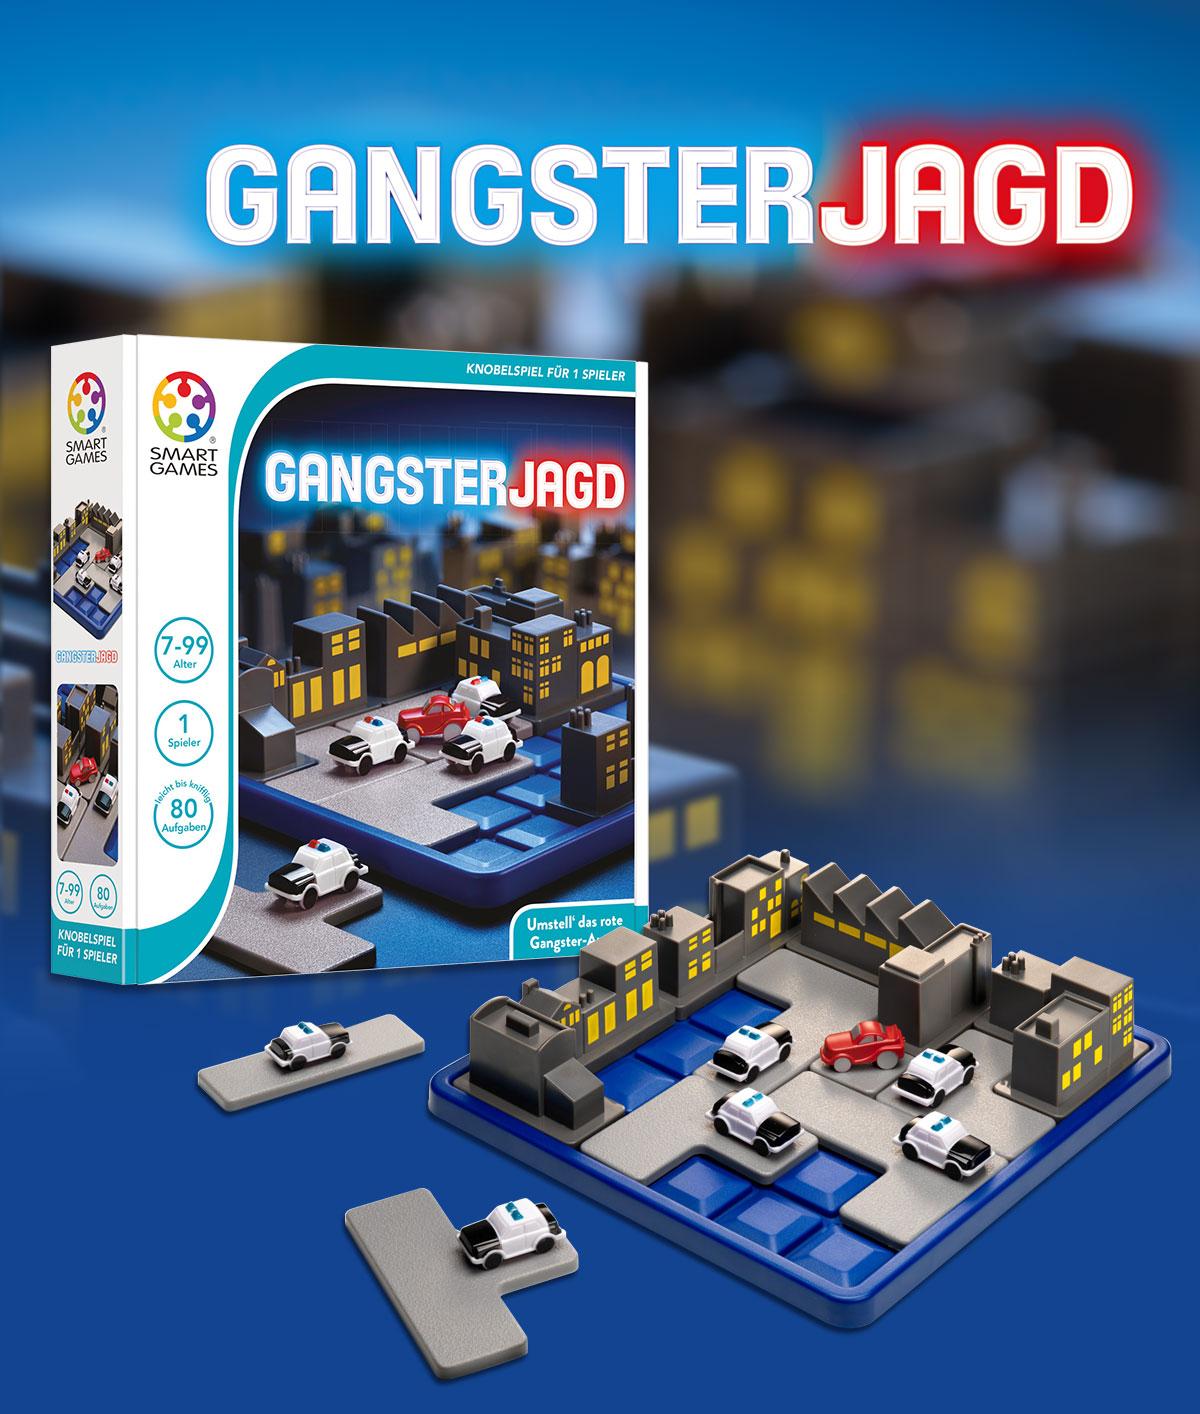 Gangsterjagd